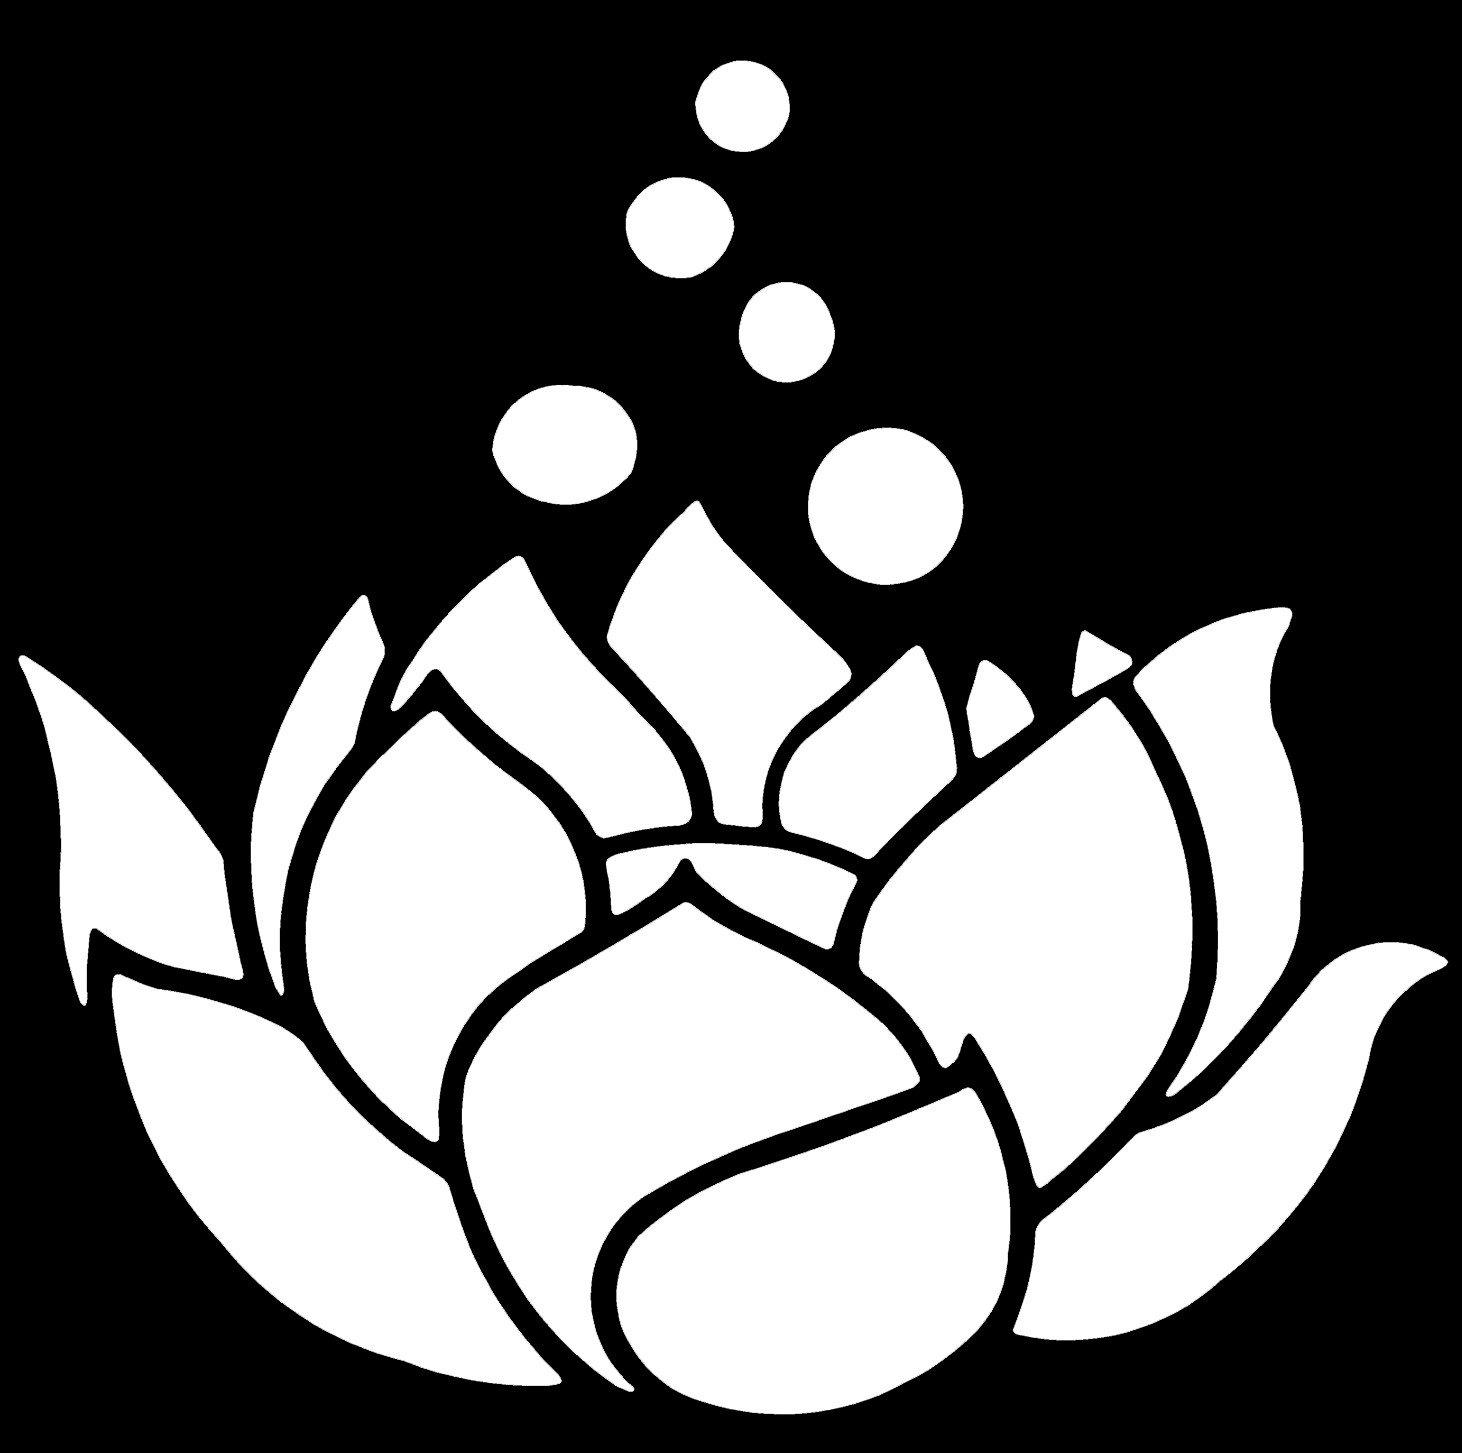 Lotus Decal Amazon